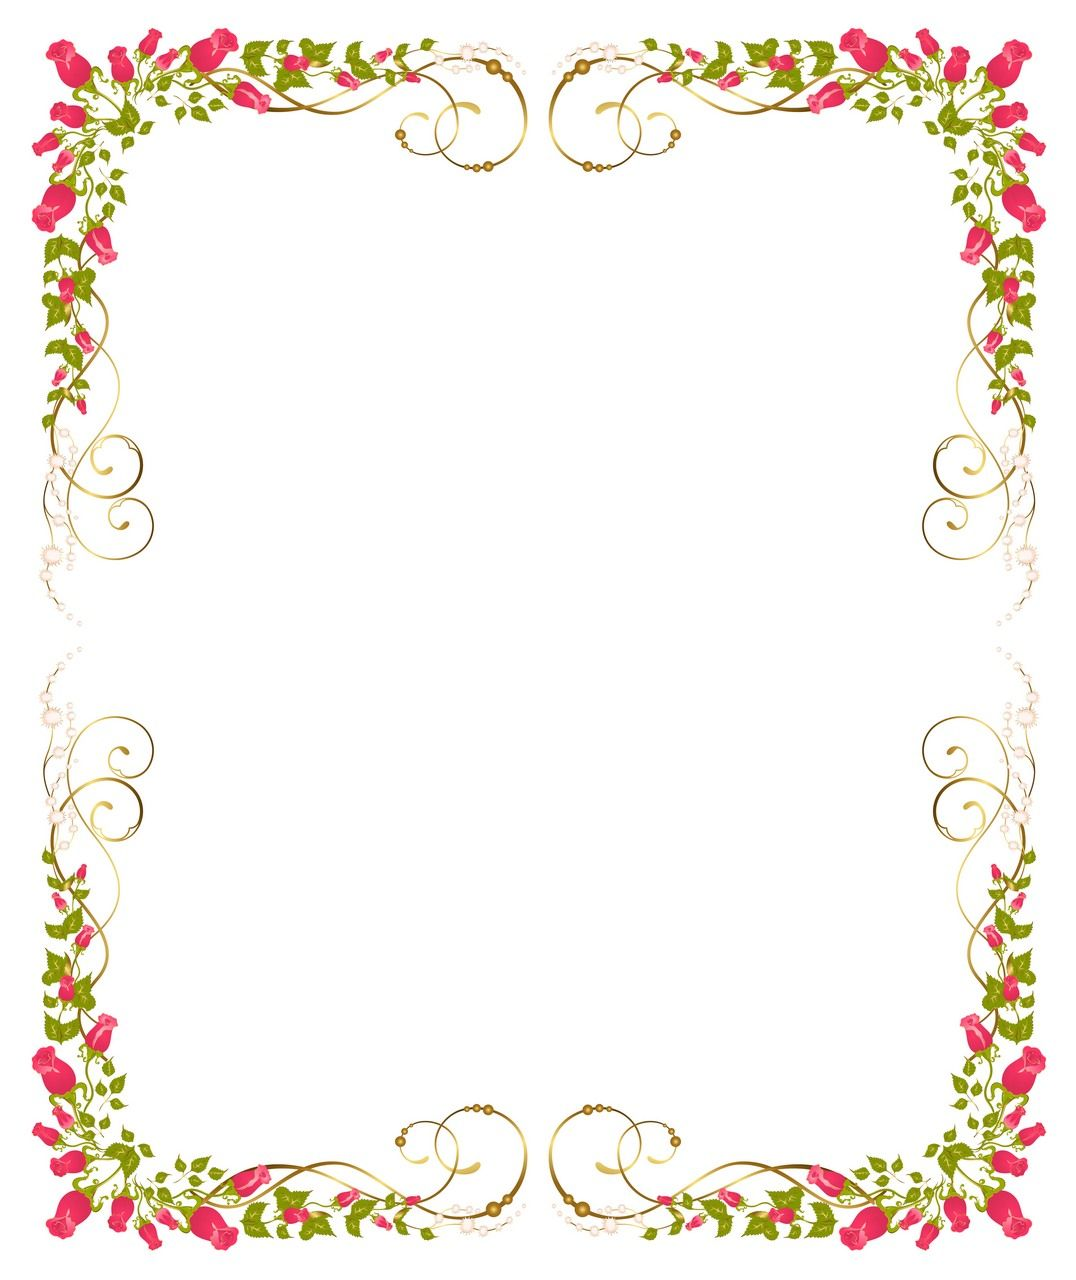 medium resolution of flower background frame 09 vector eps free download logo icons brand emblems